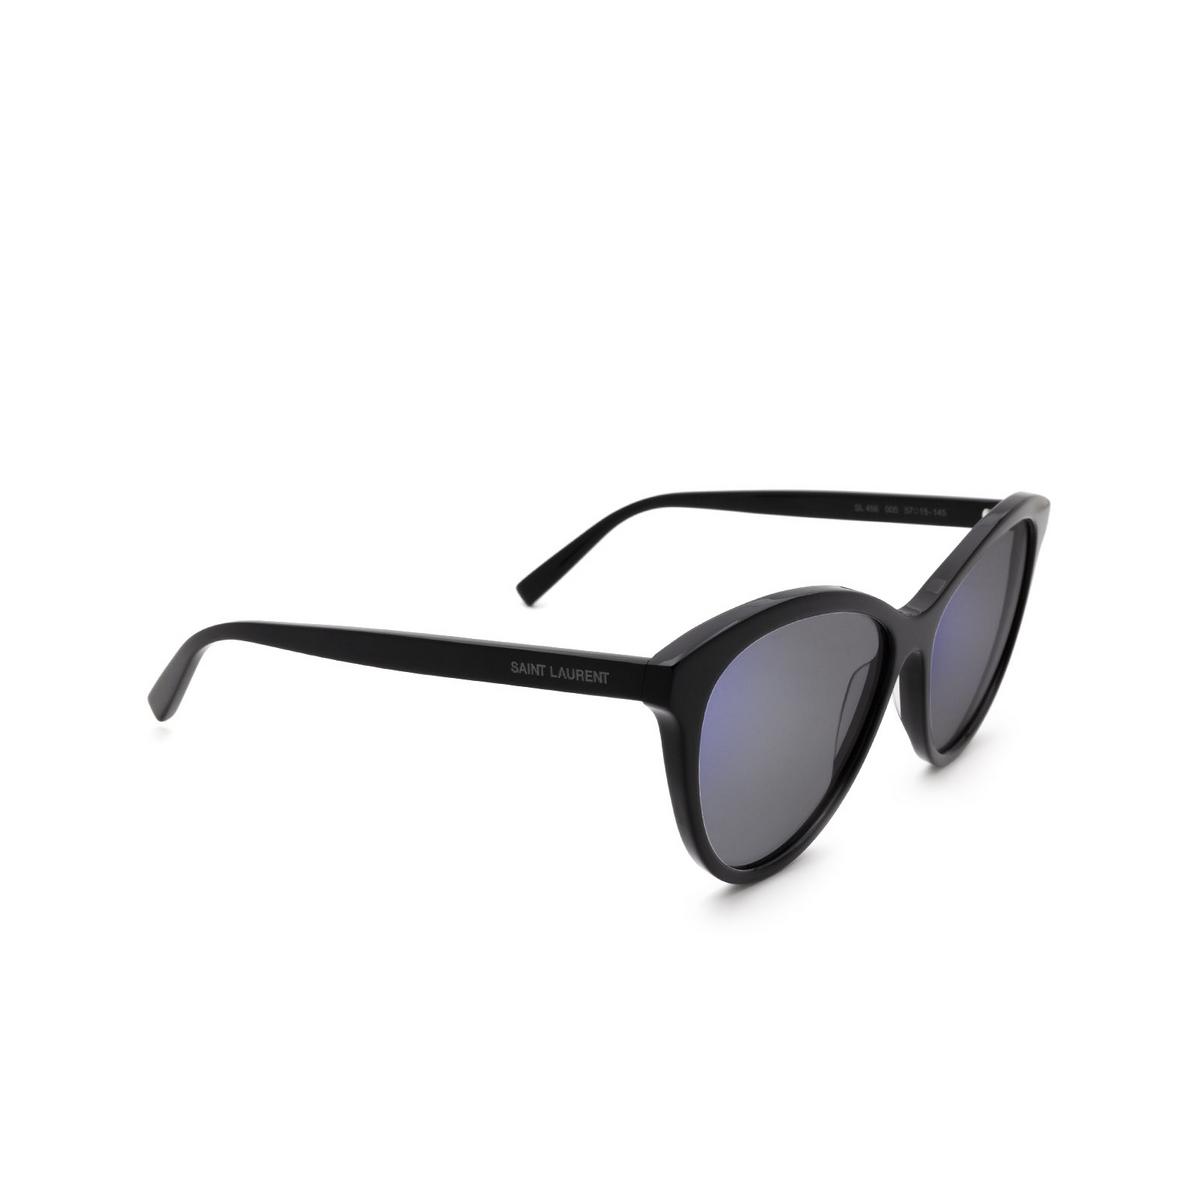 Saint Laurent® Cat-eye Sunglasses: SL 456 color Black 005 - three-quarters view.